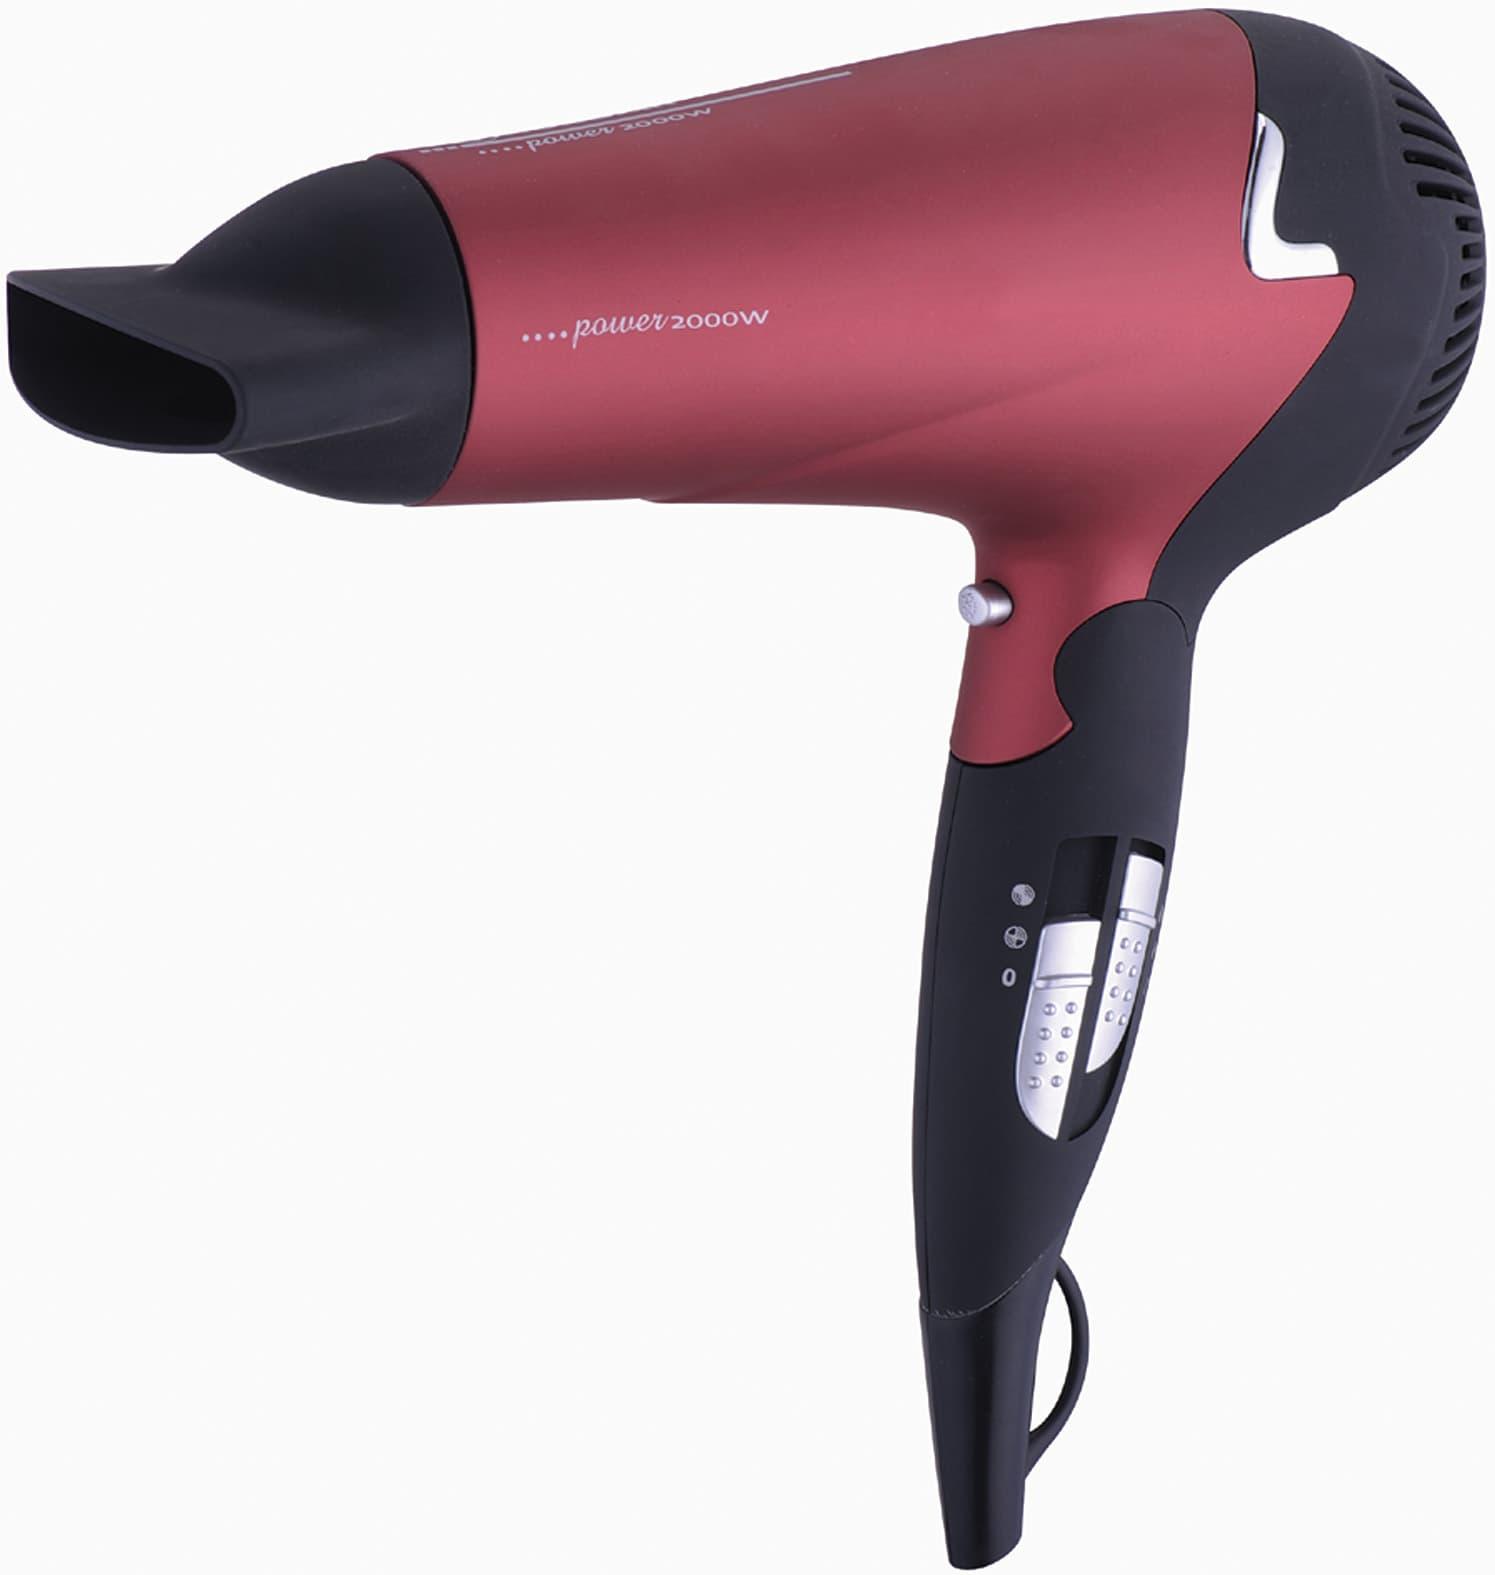 Medium Travel Hotel Foldable Hair Dryer 2000w From